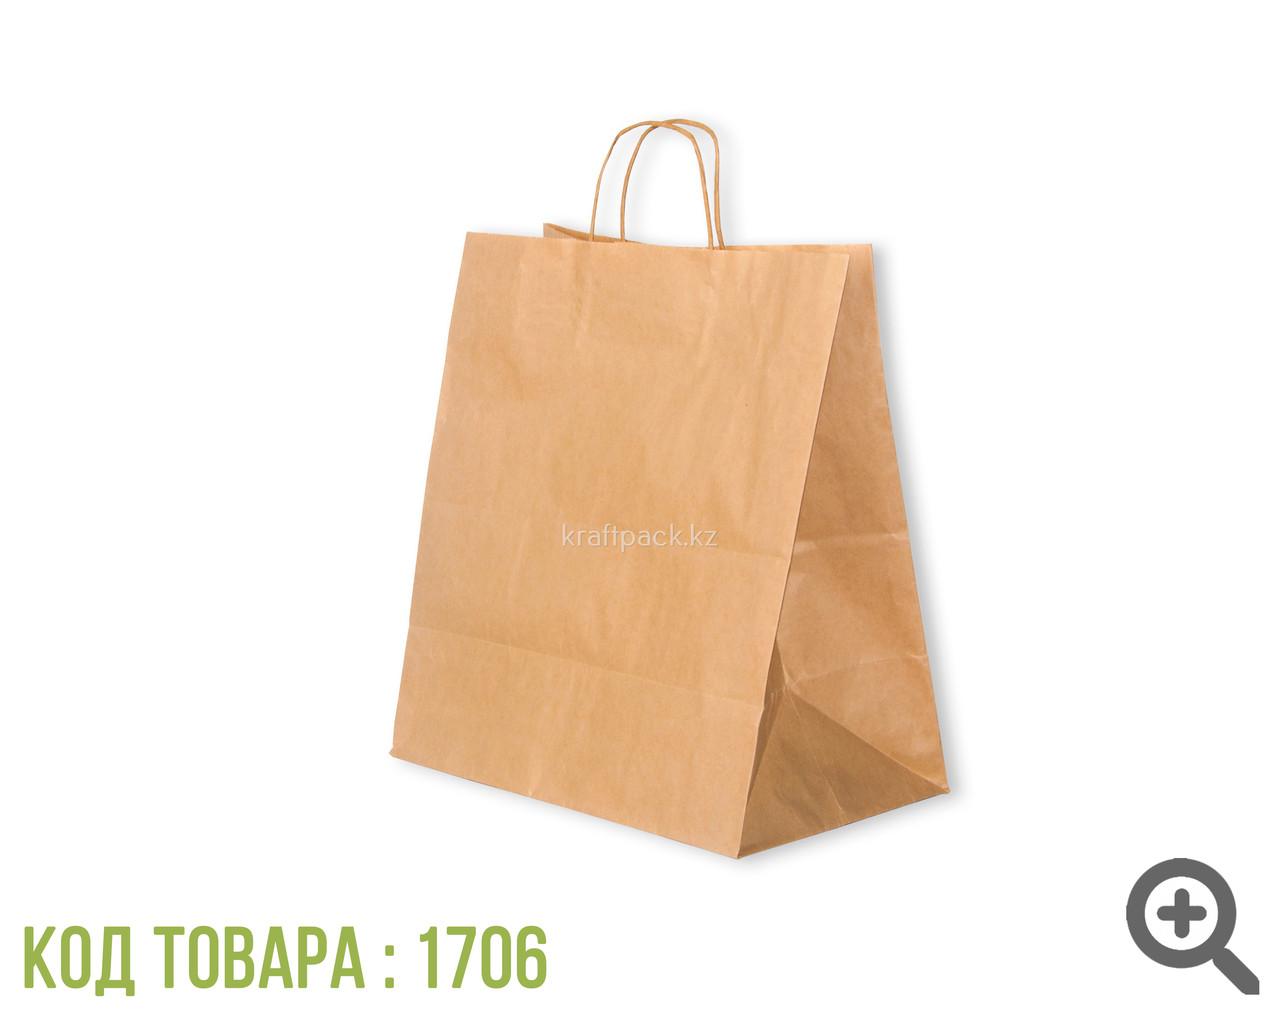 Бумажный пакет из крафт бумаги, бурый с ручкой 70гр 330*180*370 (200 шт/уп)